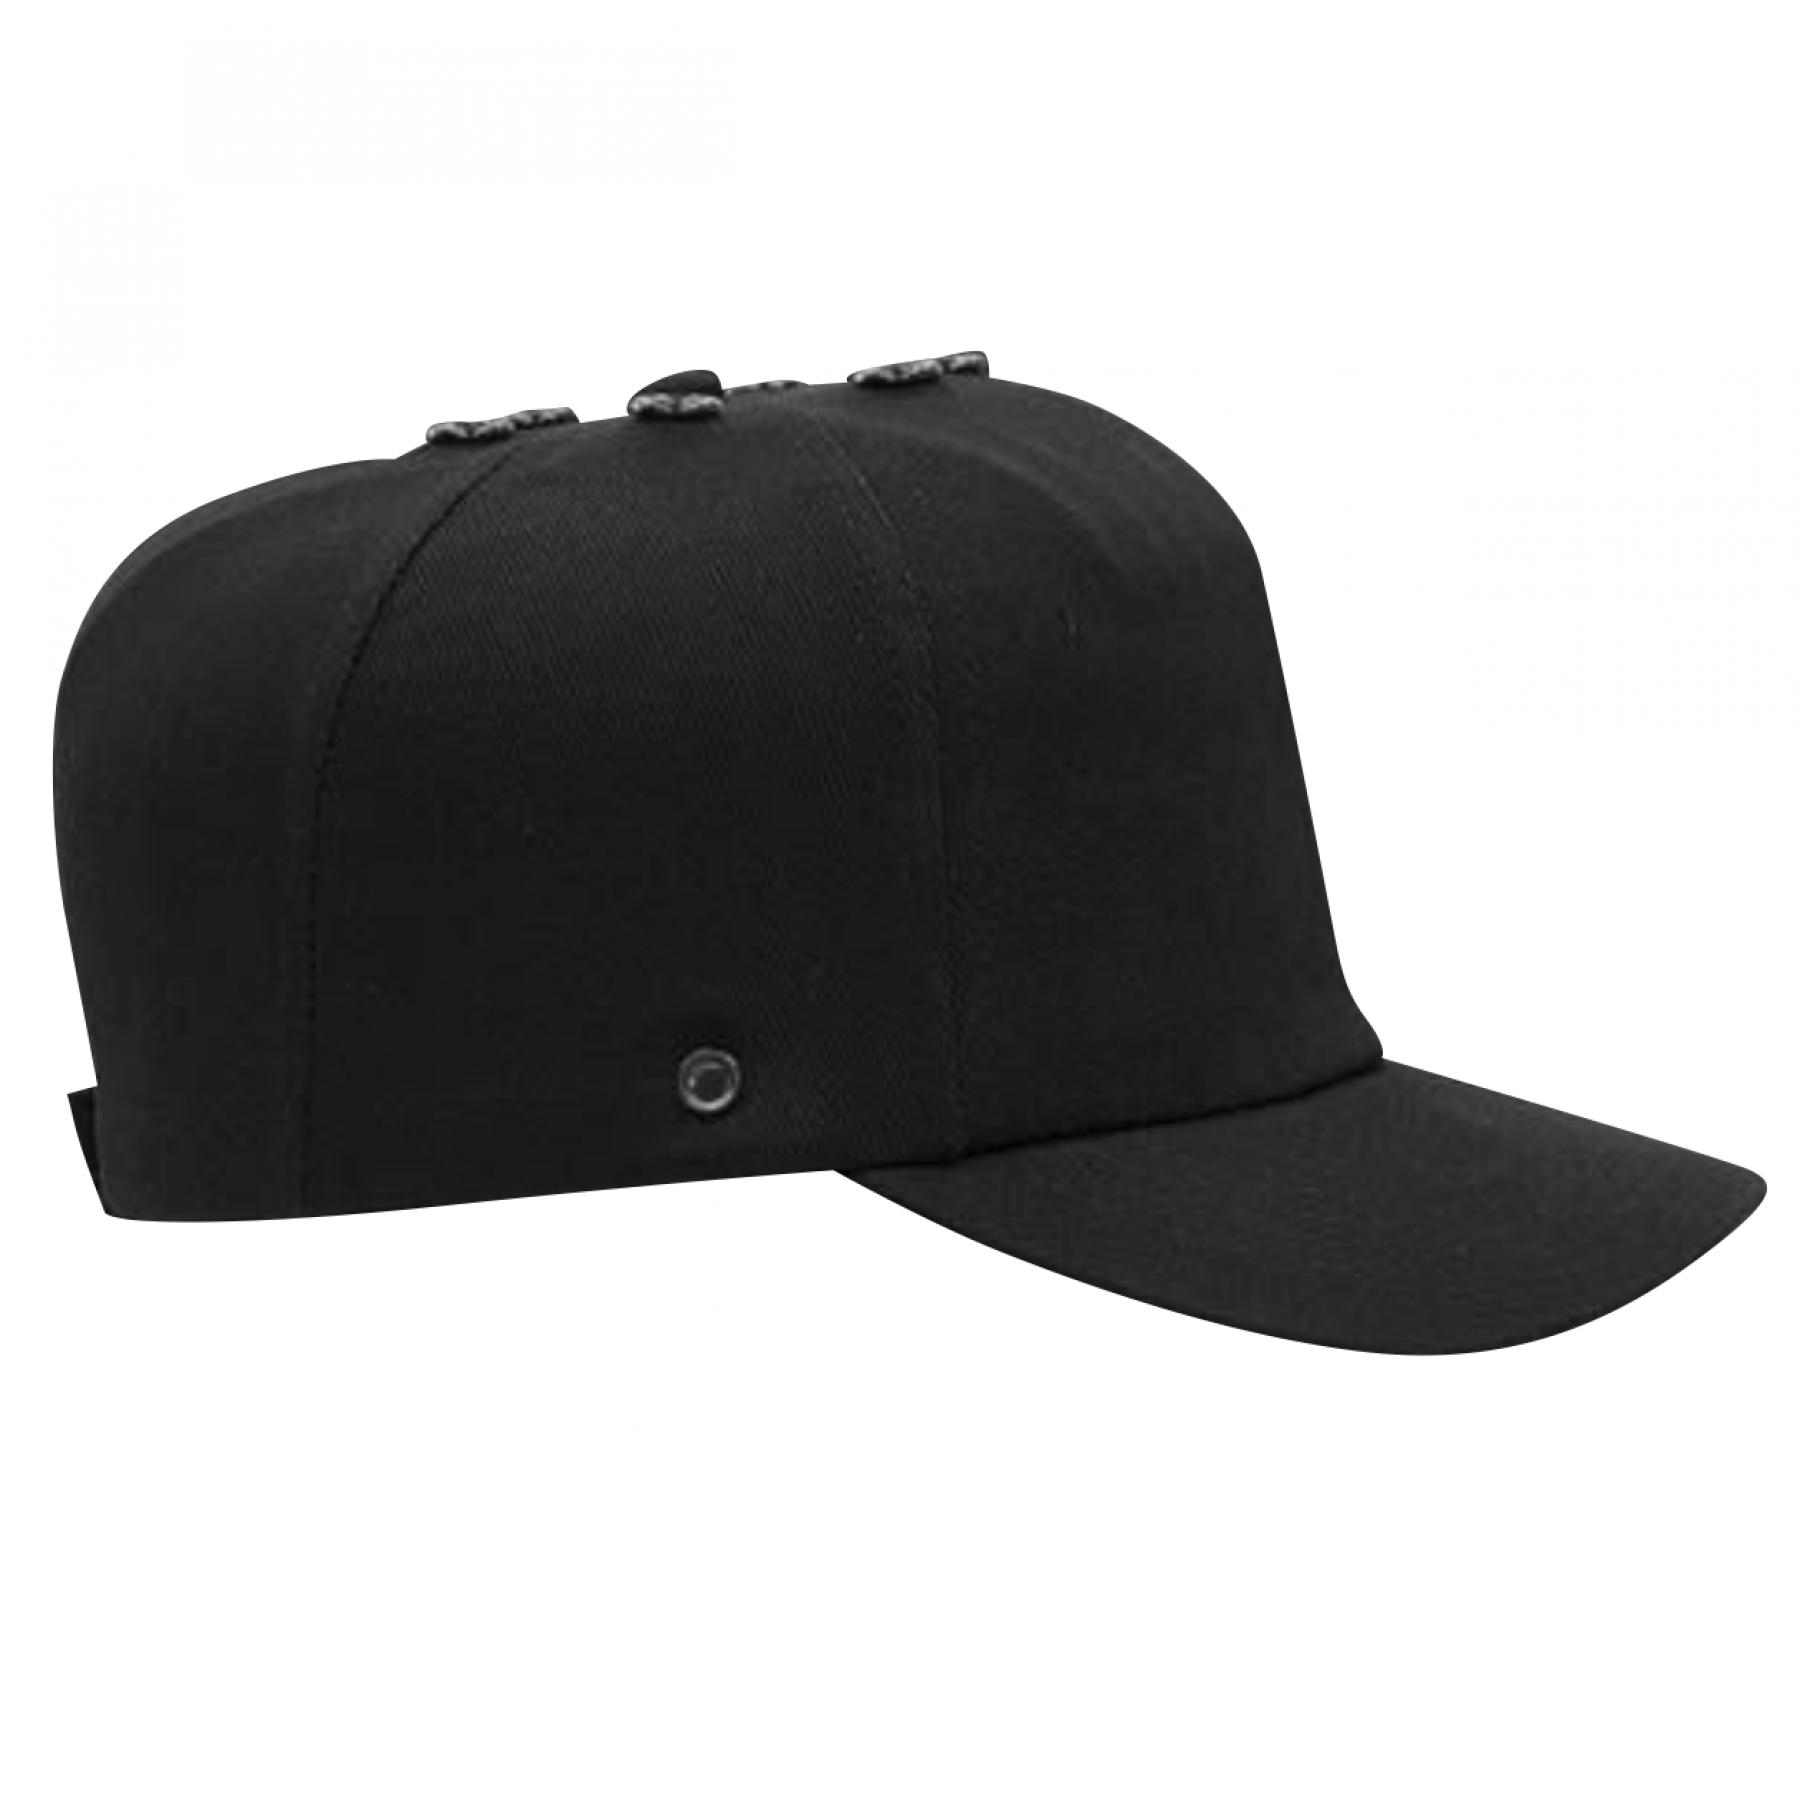 Bumpcap 100% Cotton En812, Black